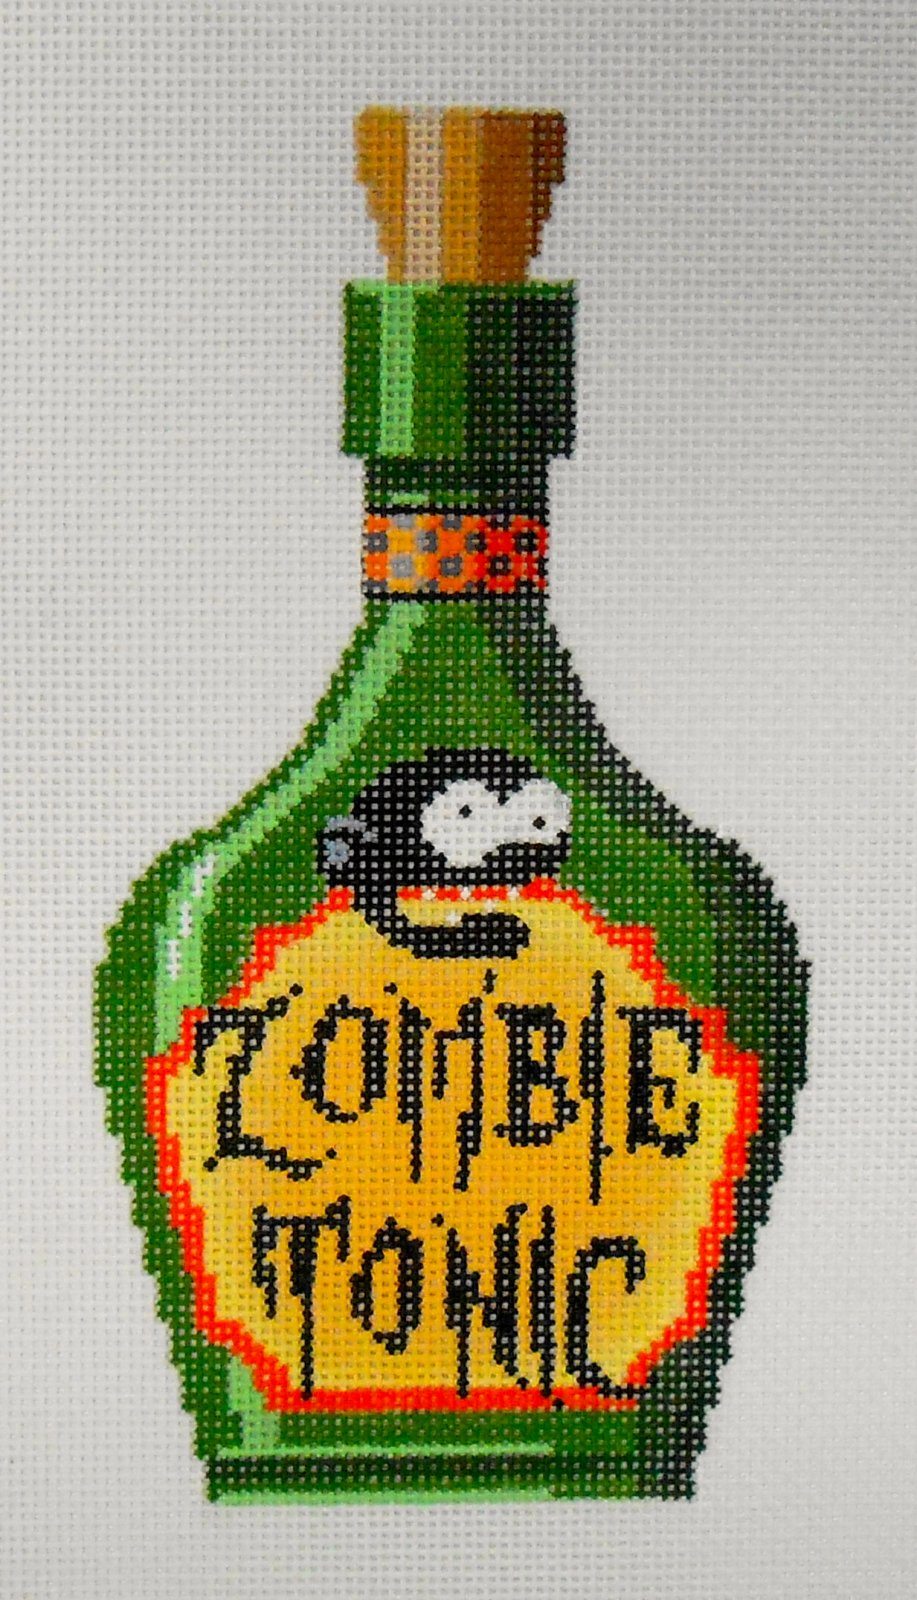 Zombie Tonic Poison Bottle